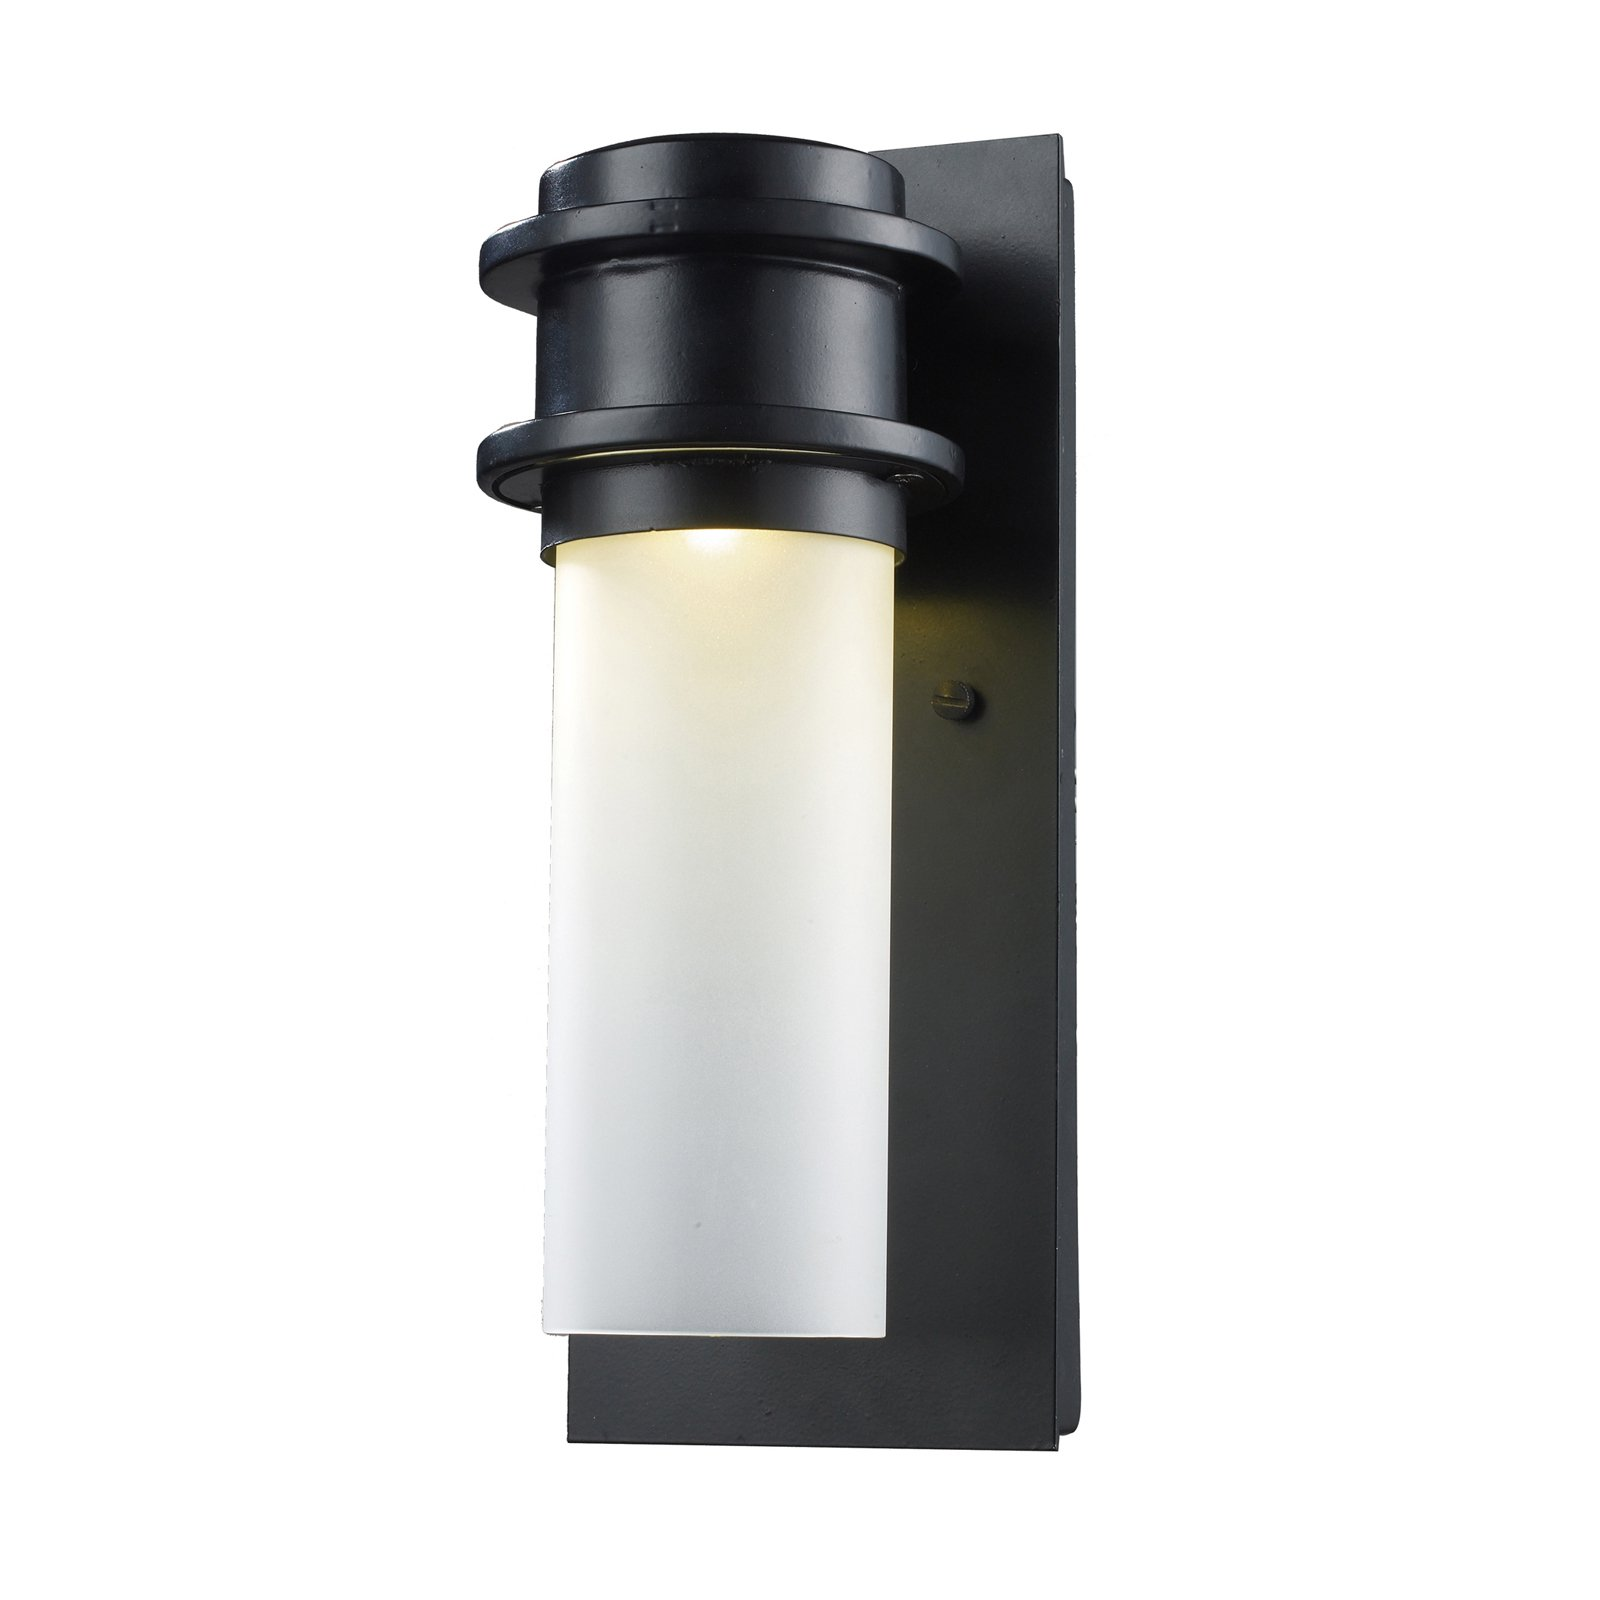 ELK Lighting Freeport 430 1-Light Outdoor LED Wall Sconce by Elk Lighting